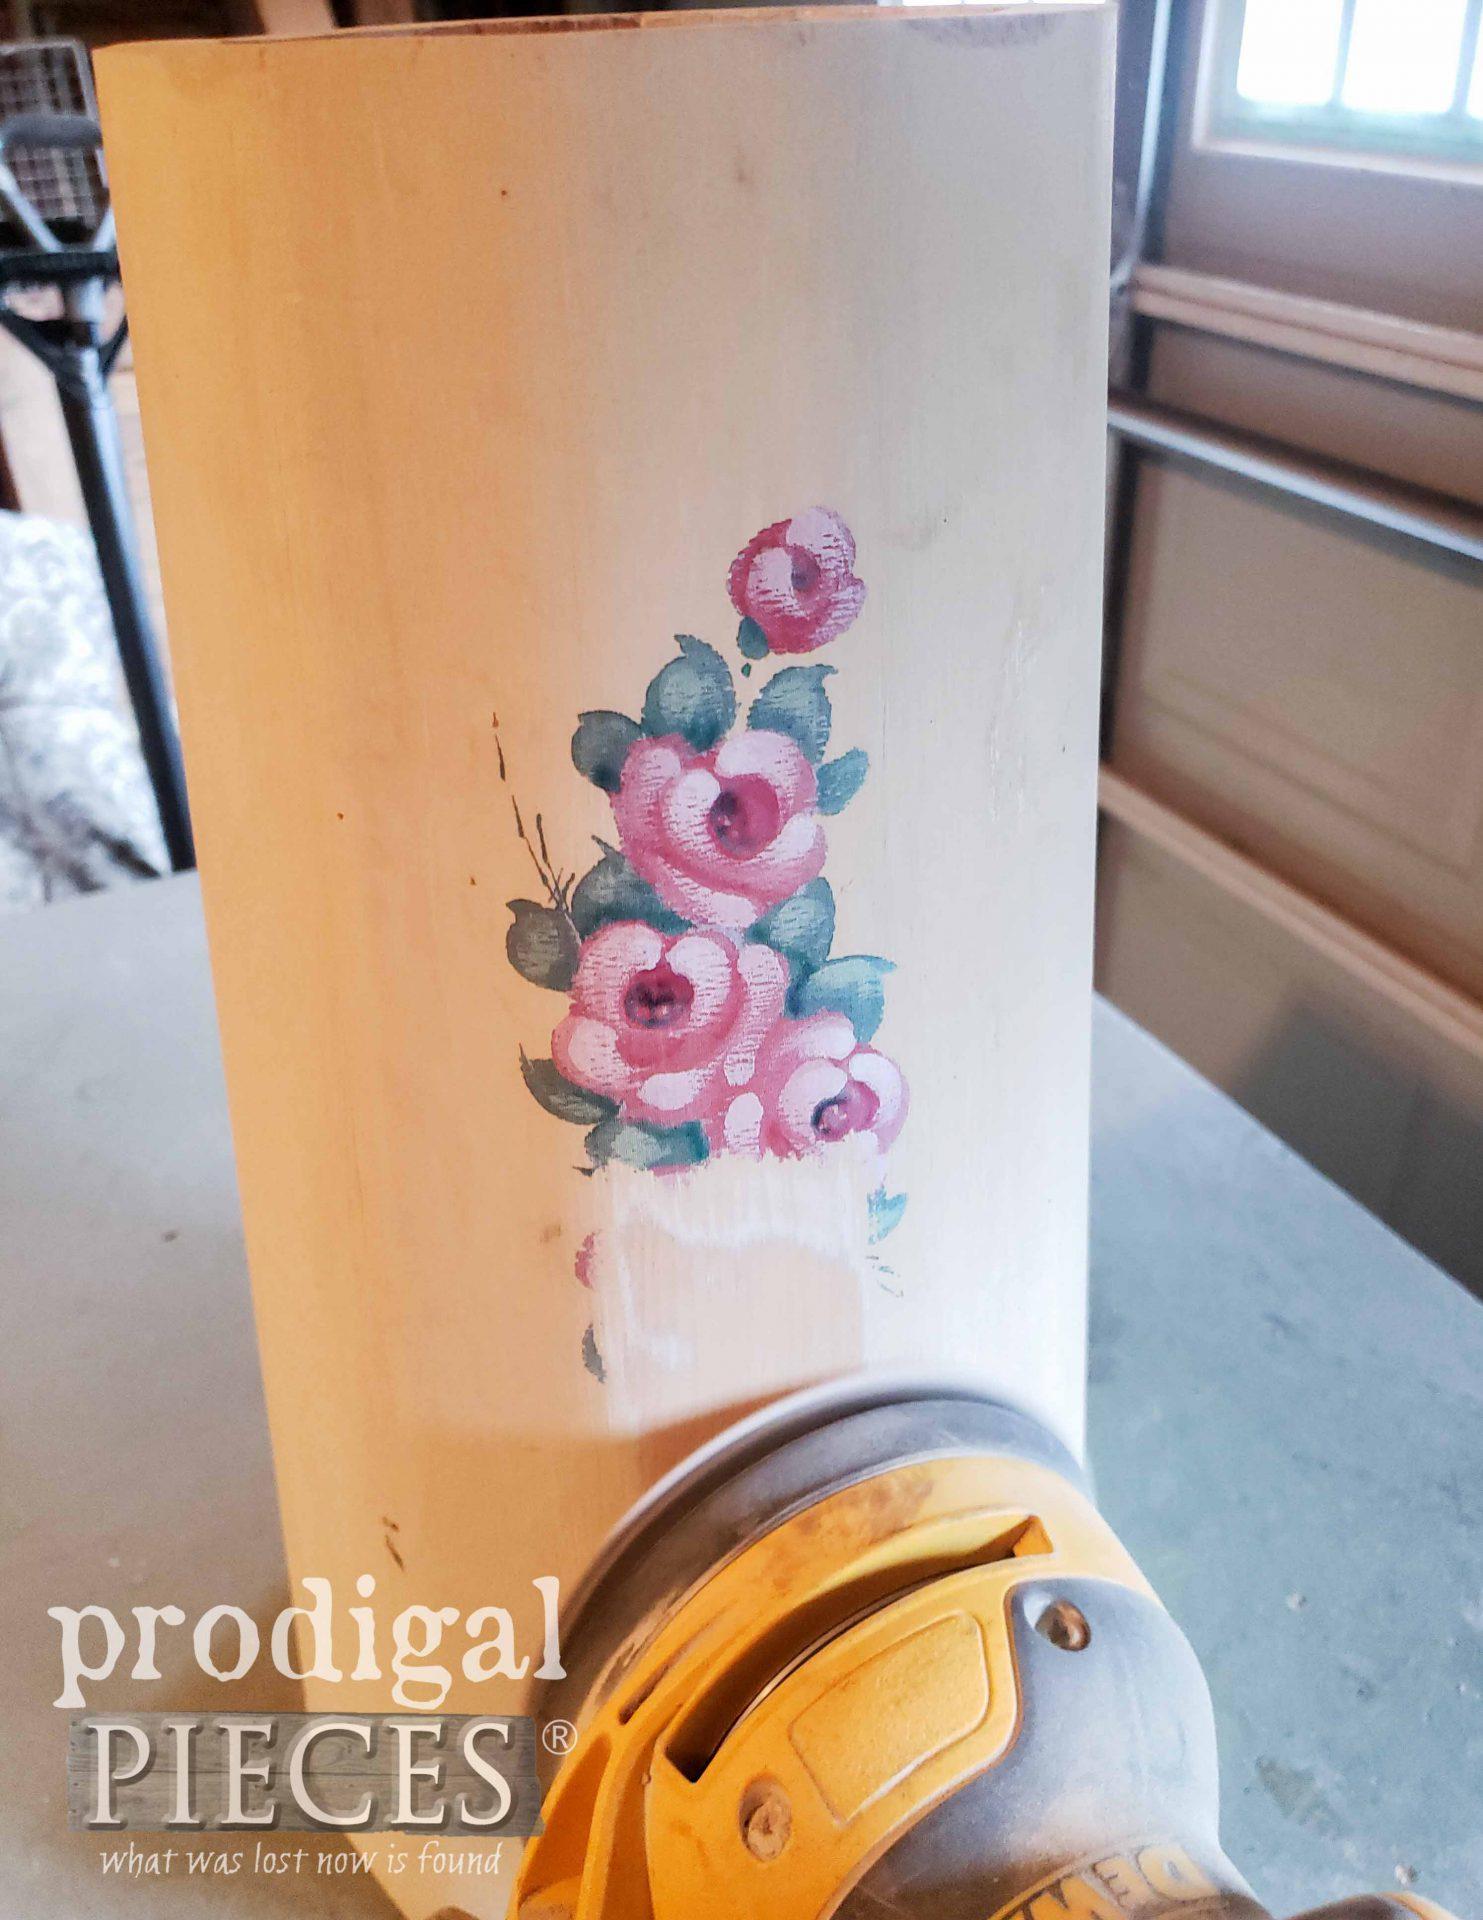 Sanding Vintage Butter Churn | prodigalpieces.com #prodigalpieces